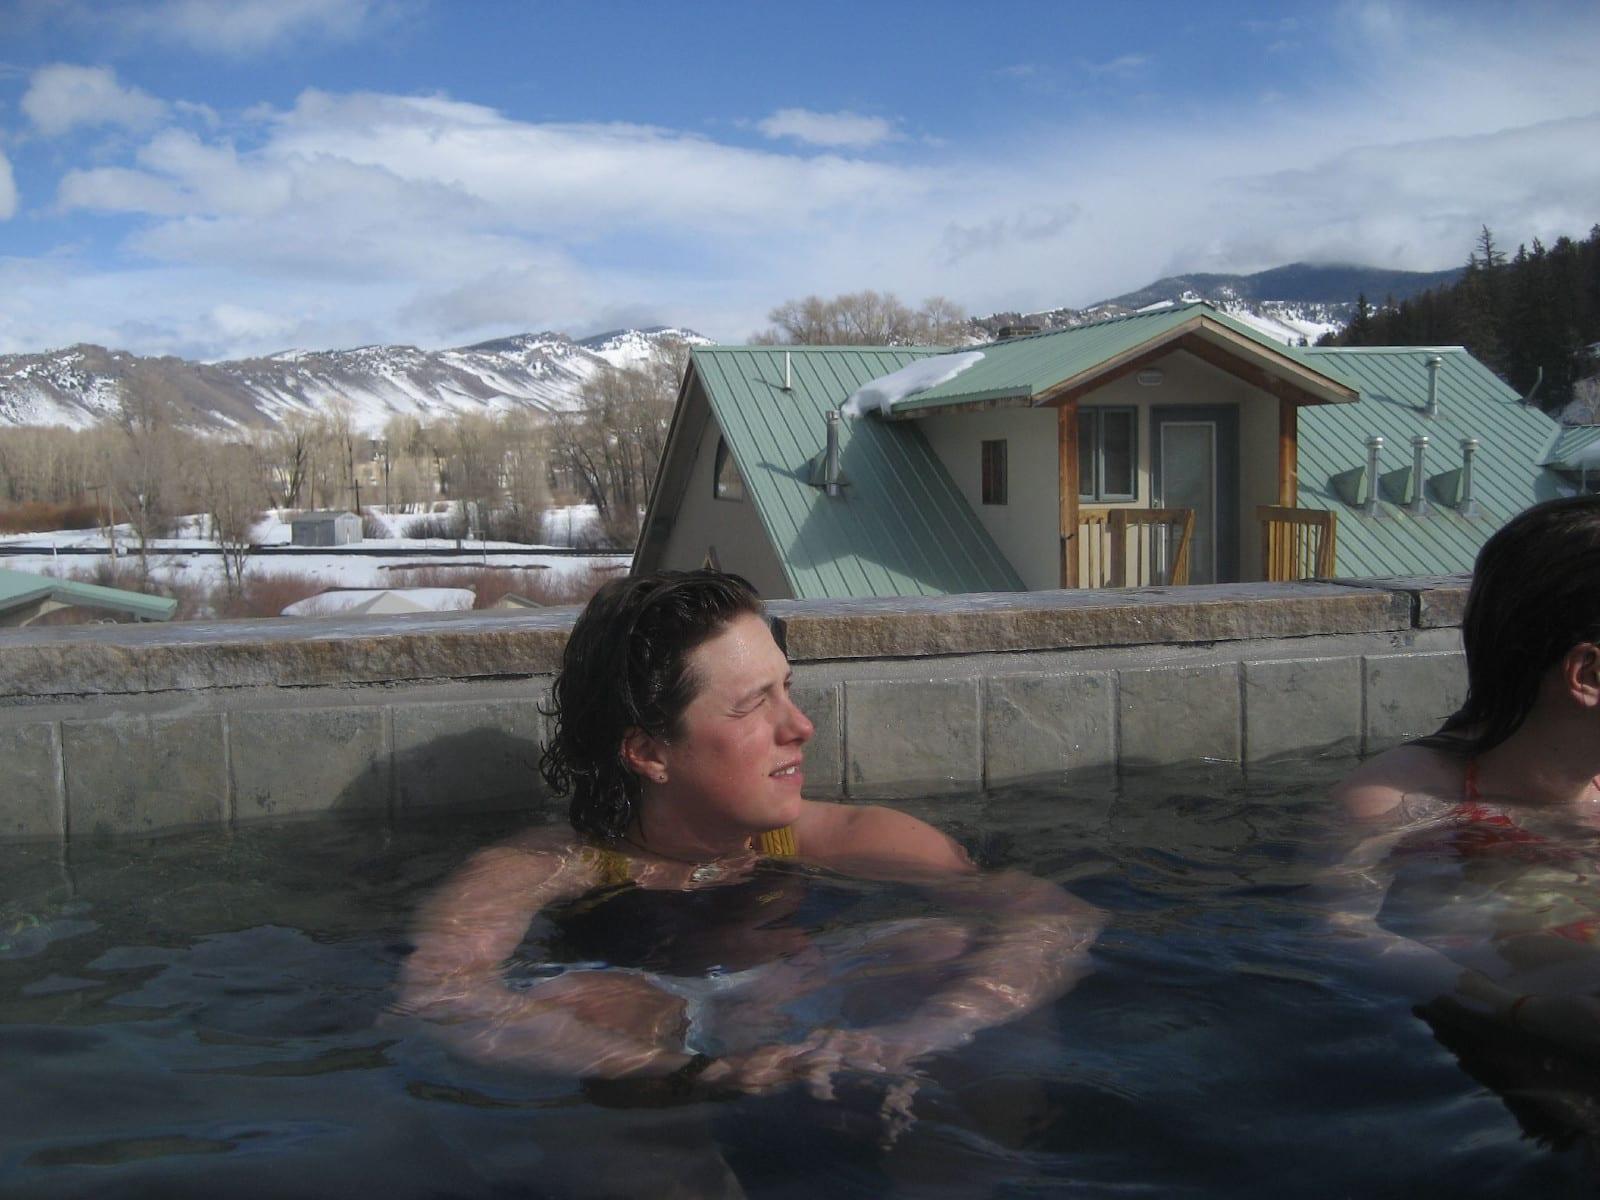 Hot Sulphur Springs Resort Colorado Women Soaking